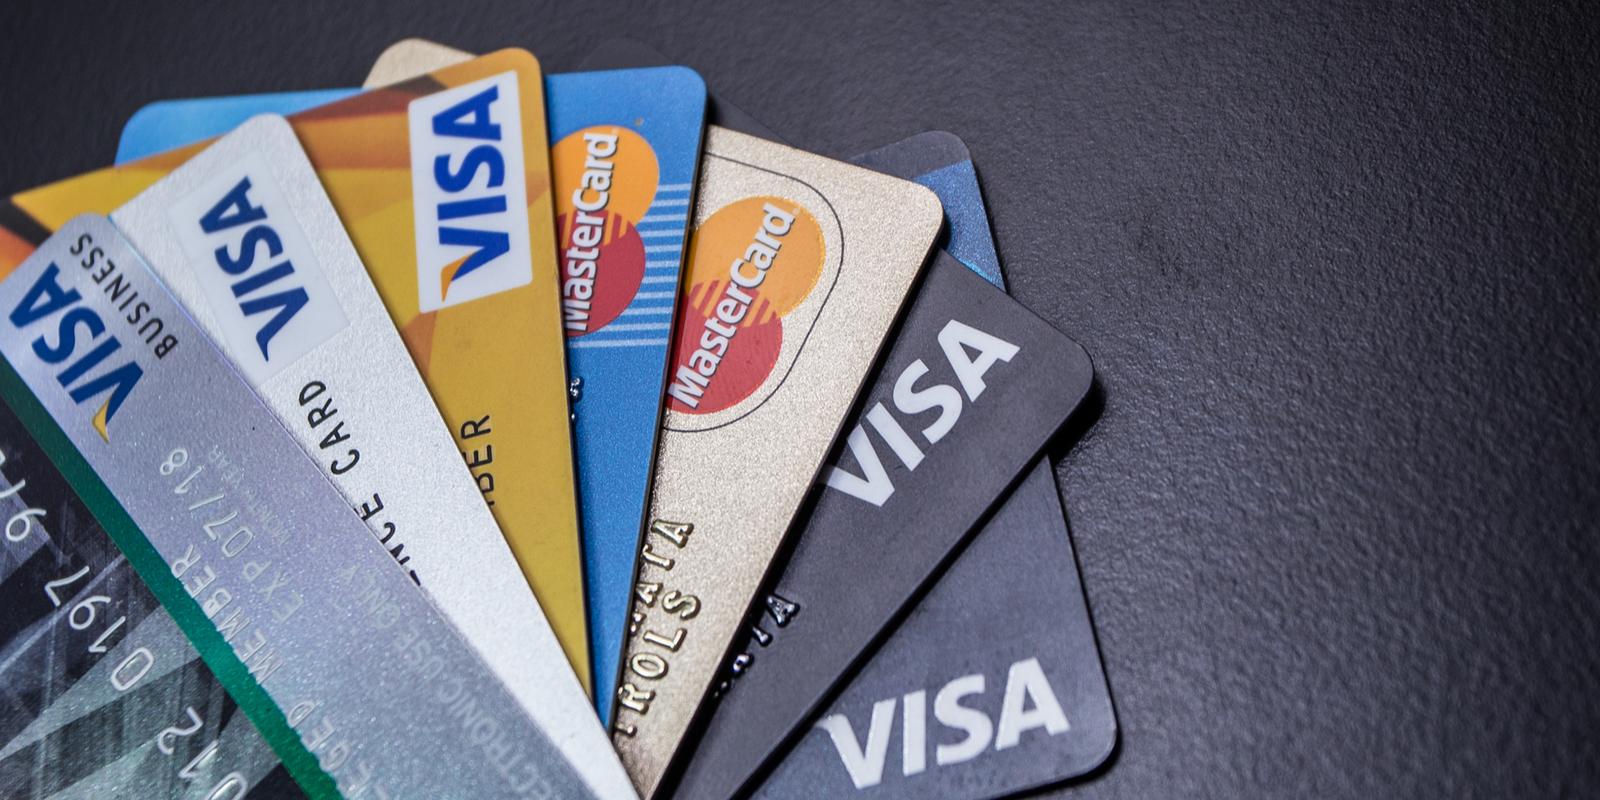 "Paypal sale de Libra - Mastercard y Visa pueden seguir ""width ="" 1600 ""height ="" 800 ""srcset ="" https://news.bitcoin.com /wp-content/uploads/2019/10/shutterstock_617054912.jpg 1600w, https://news.bitcoin.com/wp-content/uploads/2019/10/shutterstock_617054912-300x150.jpg 300w, https: //news.bitcoin .com / wp-content / uploads / 2019/10 / shutterstock_617054912-768x384.jpg 768w, https://news.bitcoin.com/wp-content/uploads/2019/10/shutterstock_617054912-1024x512.jpg 1024w, https: / /news.bitcoin.com/wp-content/uploads/2019/10/shutterstock_617054912-696x348.jpg 696w, https://news.bitcoin.com/wp-content/uploads/2019/10/shutterstock_617054912-1392x696.jpg 1392w , https://news.bitcoin.com/wp-content/uploads/2019/10/shutterstock_617054912-1068x534.jpg 1068w, https://news.bitcoin.com/wp-content/uploads/2019/10/shutterstock_617054912- 840x420.jpg 840w ""tamaños ="" (ancho máximo: 1600px) 100vw, 1600px"